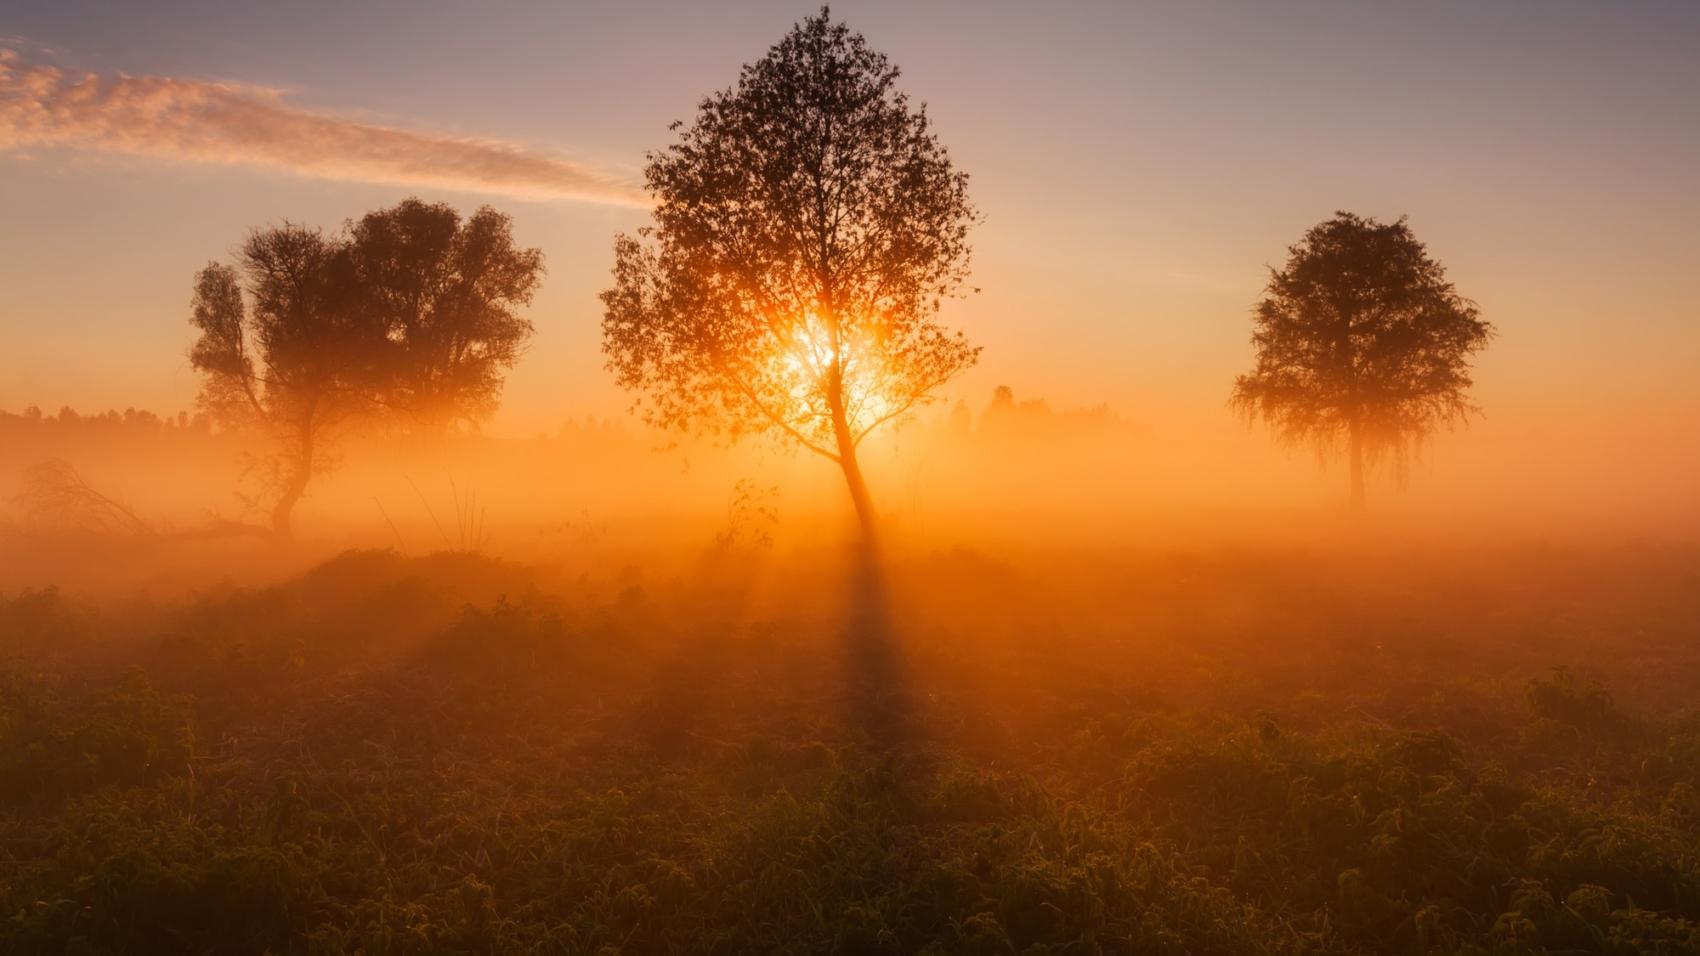 Matin, soleil levant et brouillard  by antonpetrus